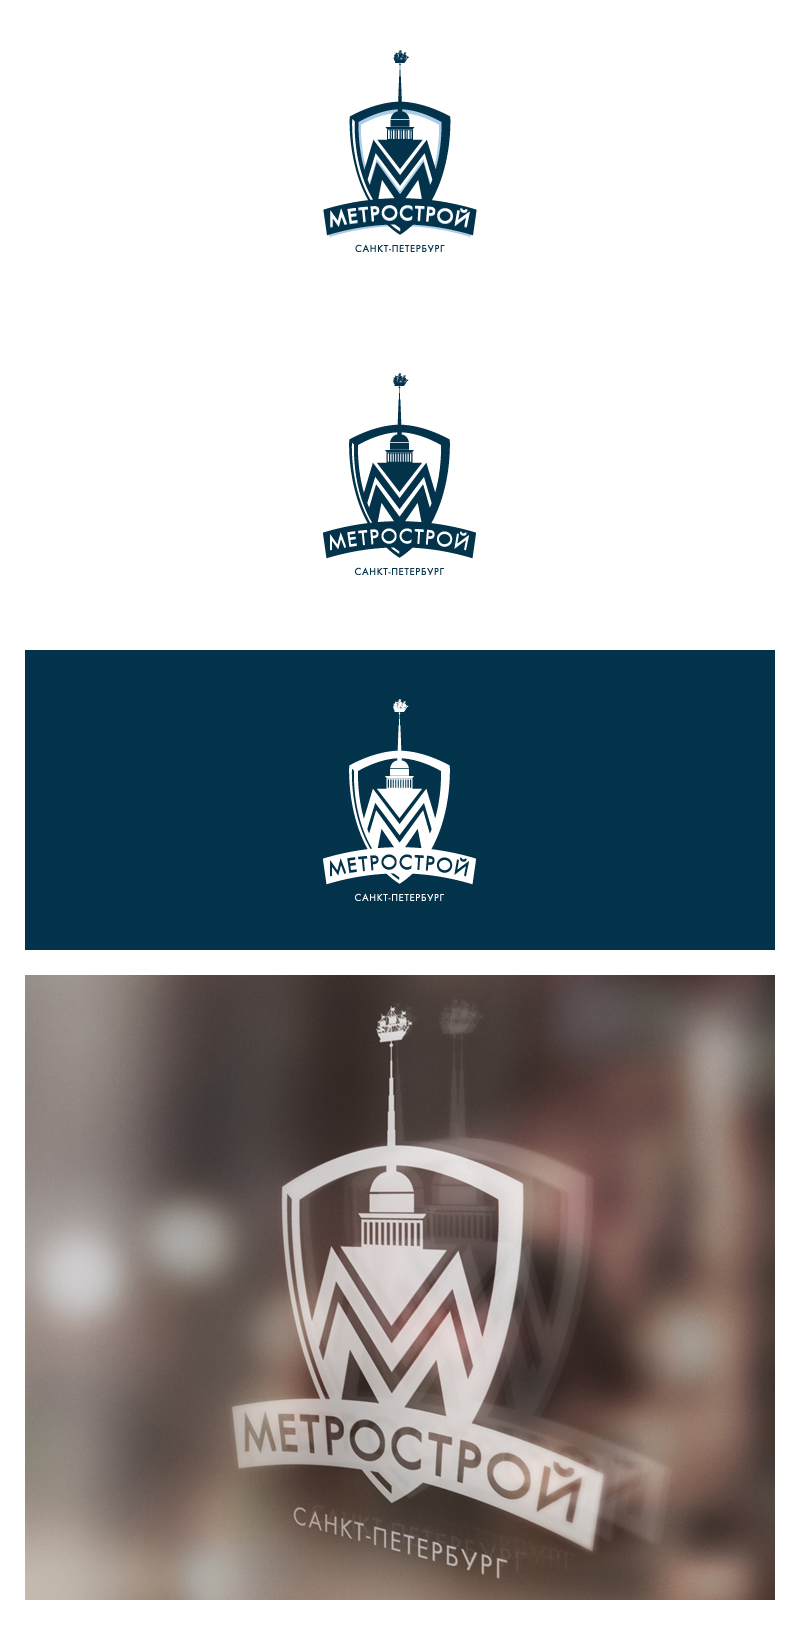 Разработка логотипа МЕТРОСТРОЙ Санкт-Петербург